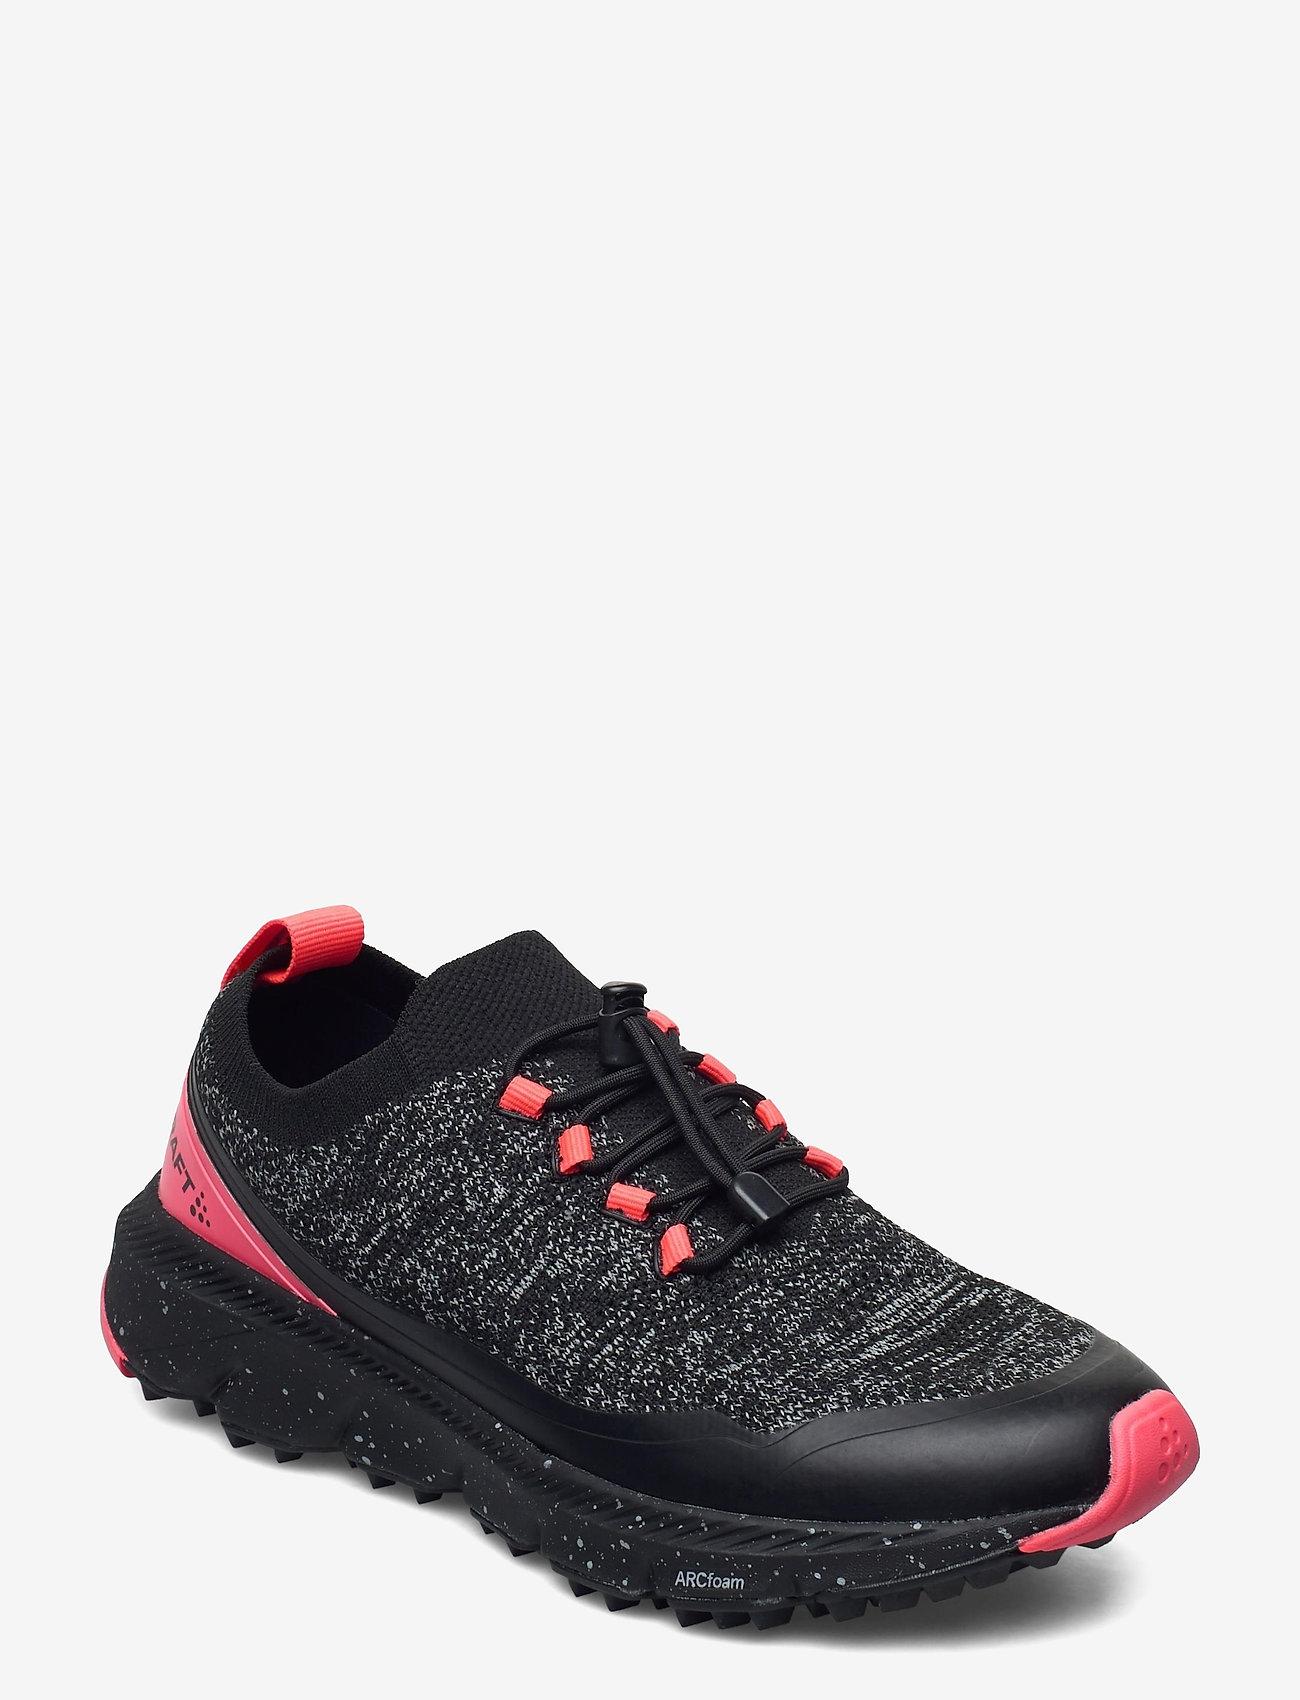 Craft - NORDIC FUSEKNIT W - running shoes - black/crush - 0